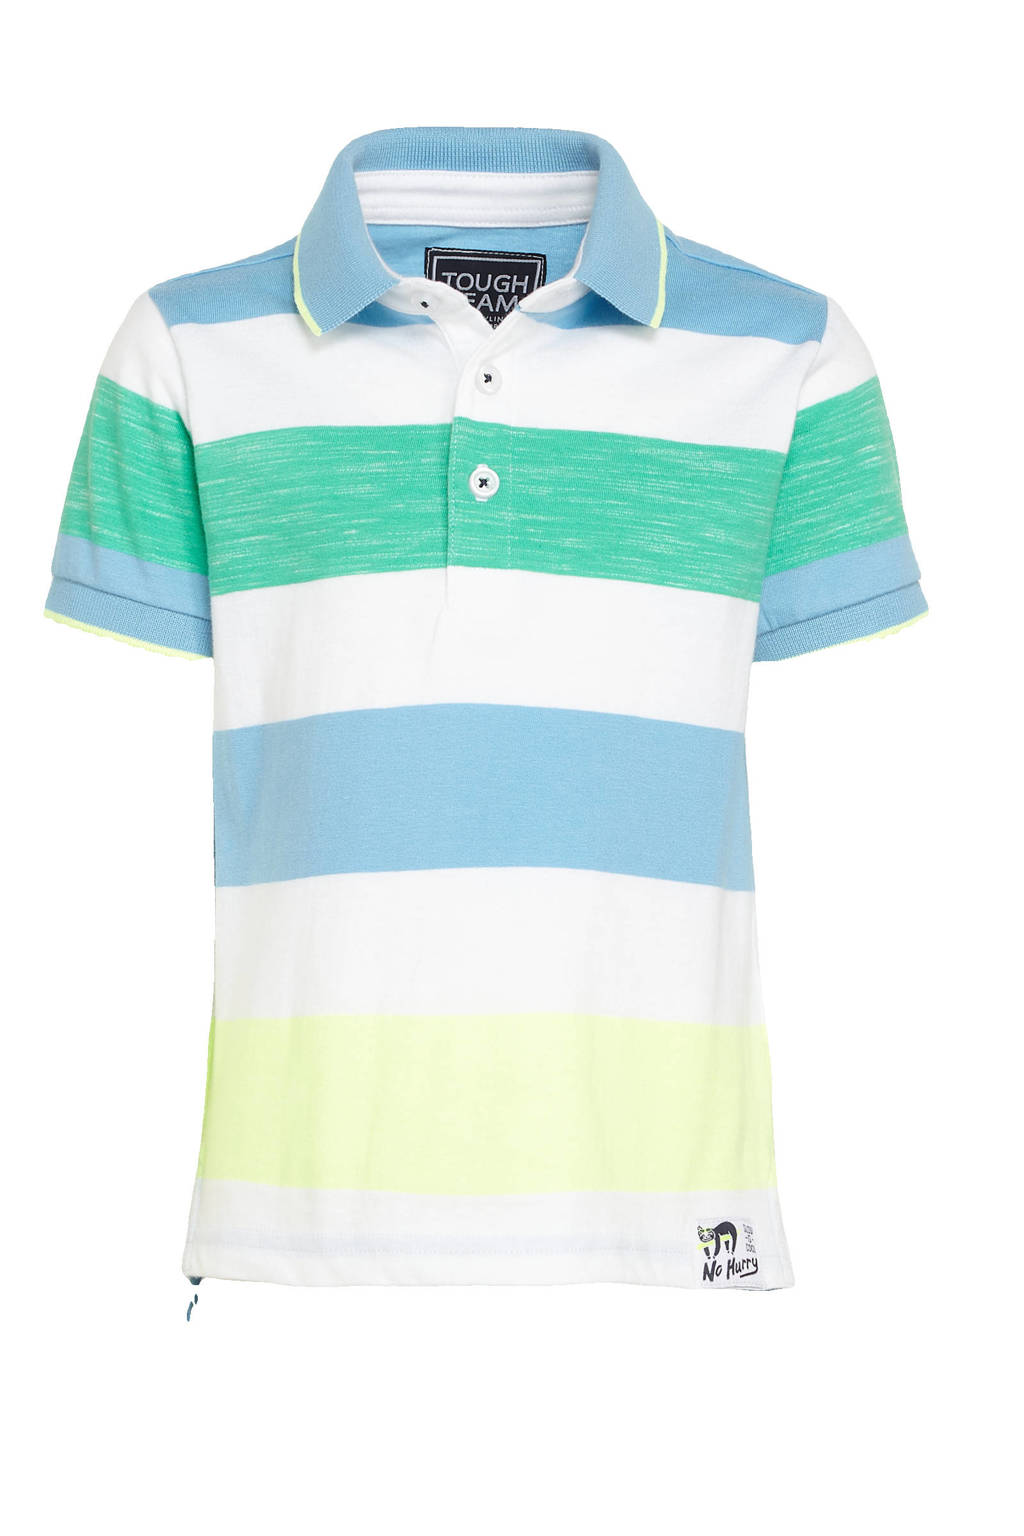 C&A Palomino gestreepte polo wit/blauw/groen/geel, Wit/blauw/groen/geel